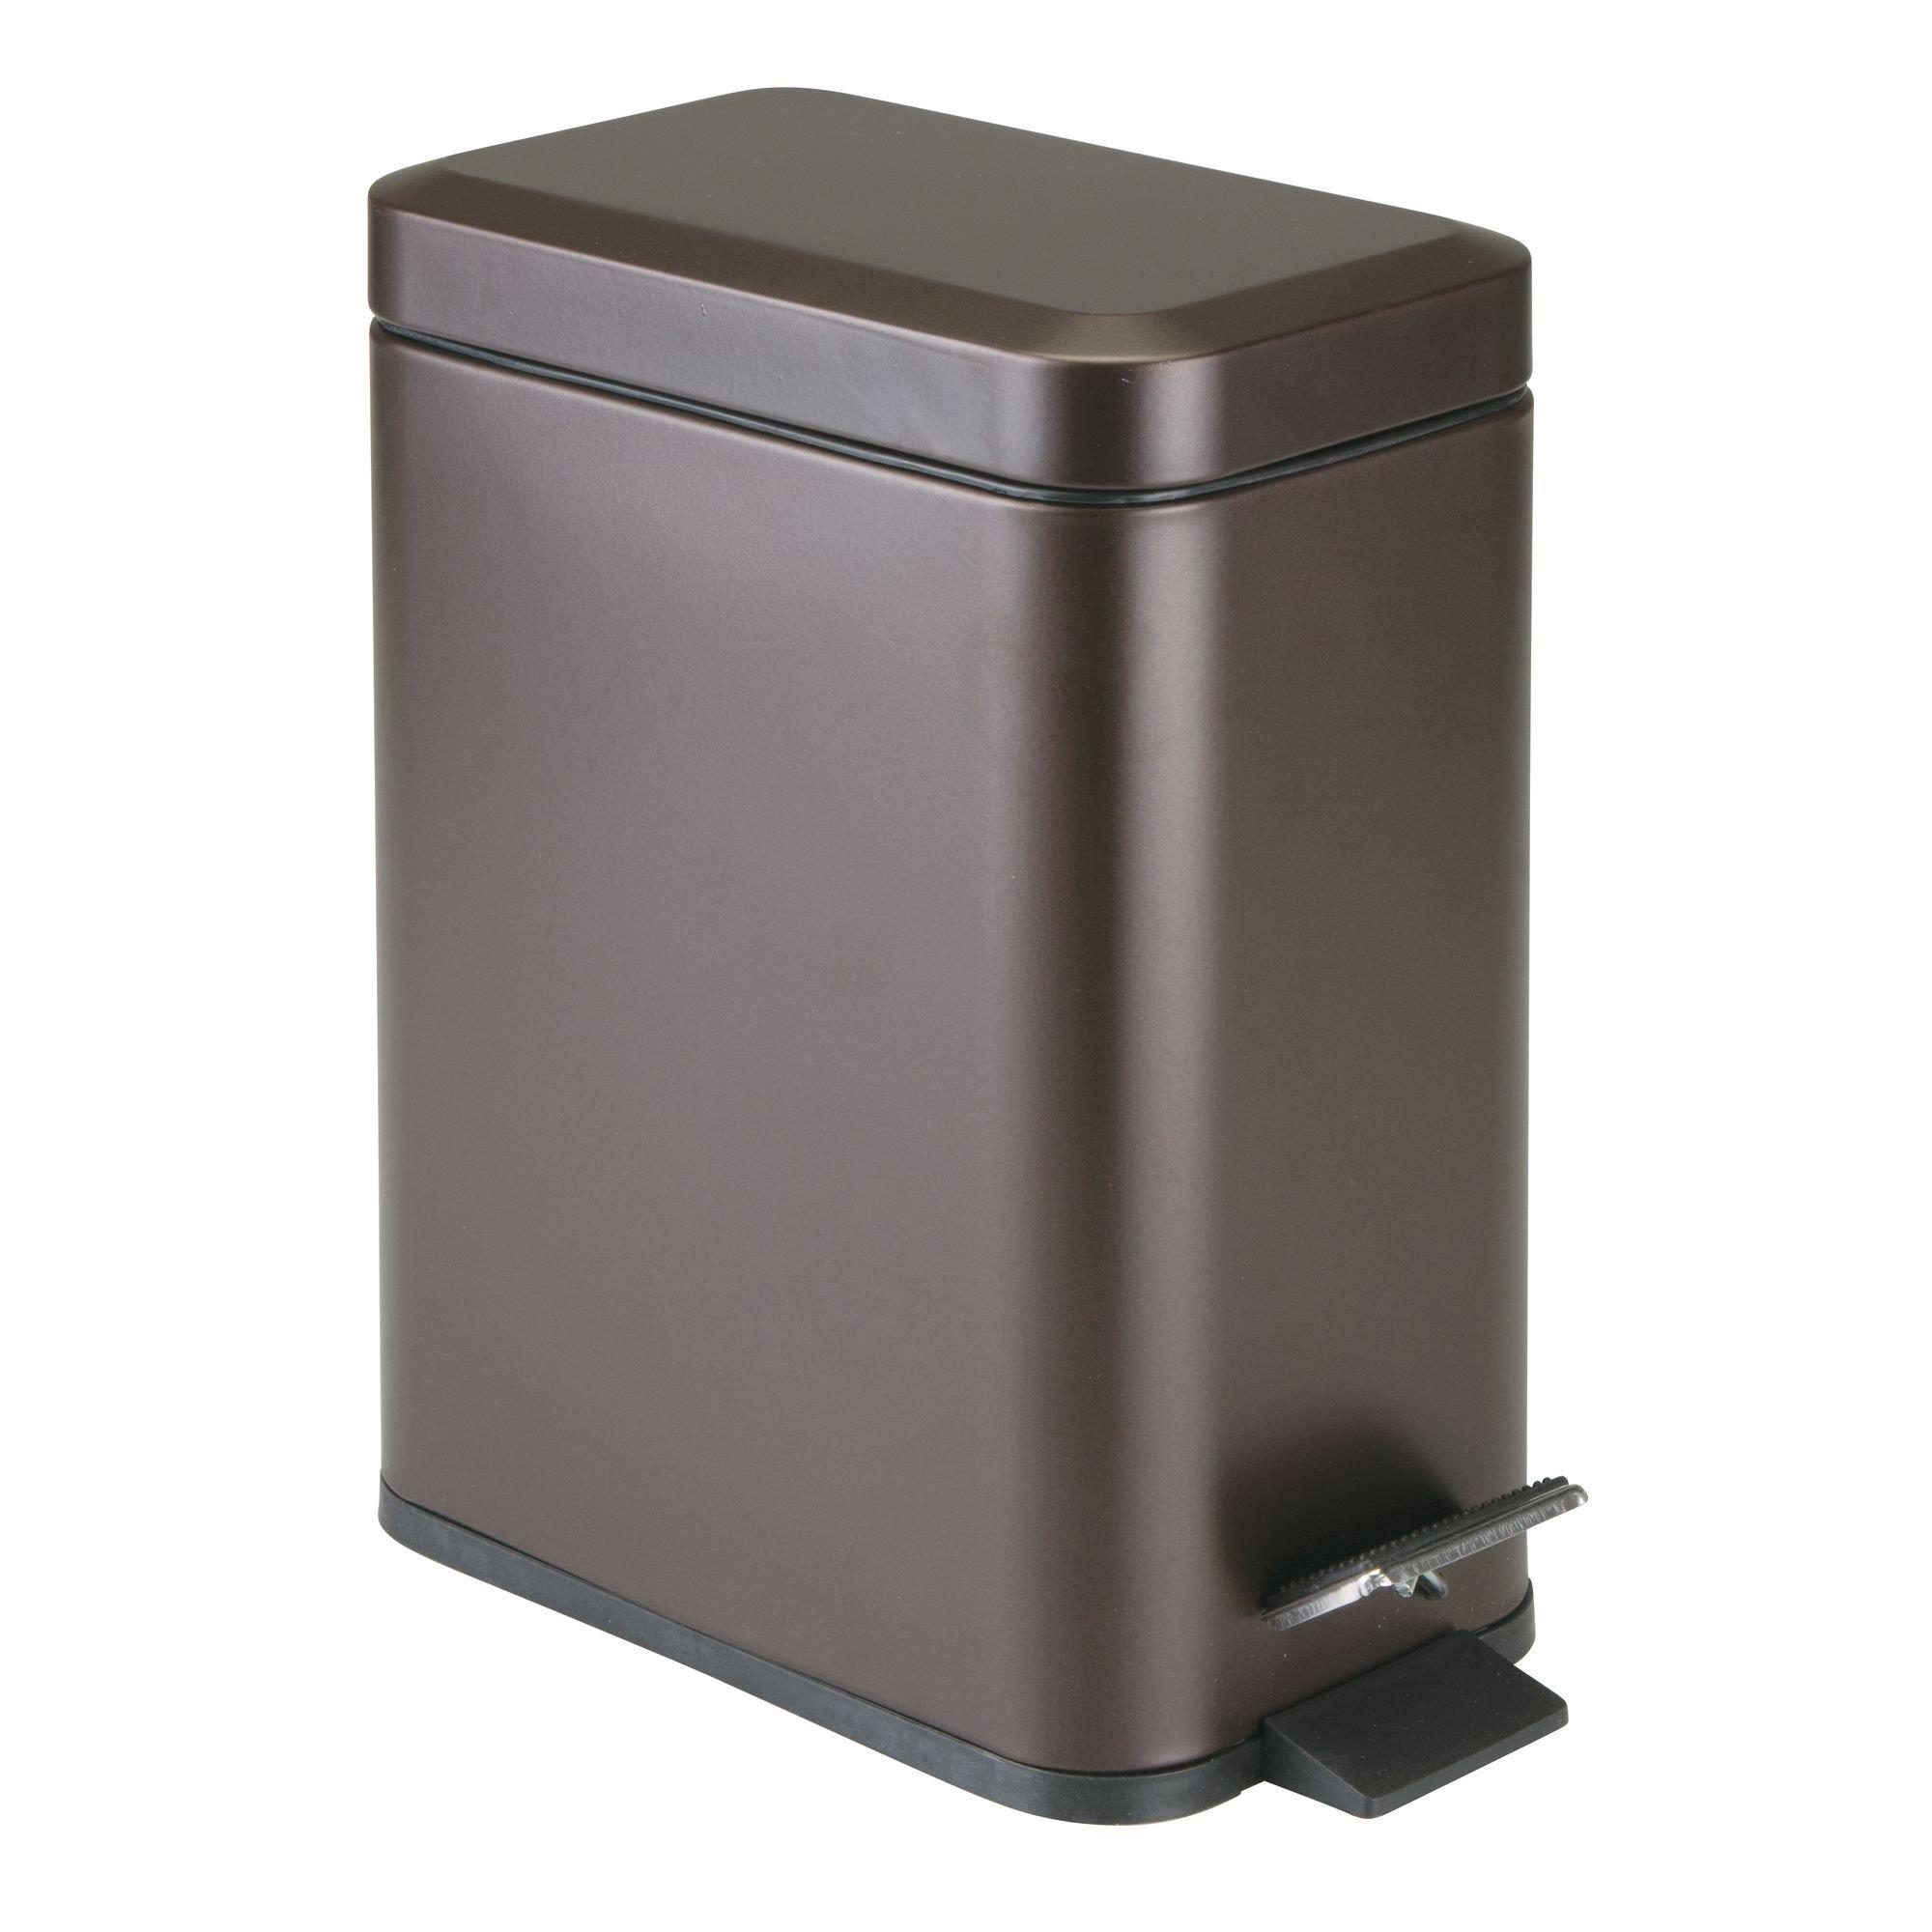 Amazon Com 1 2 2 Gallon Small Trash Bags Office Bedroom